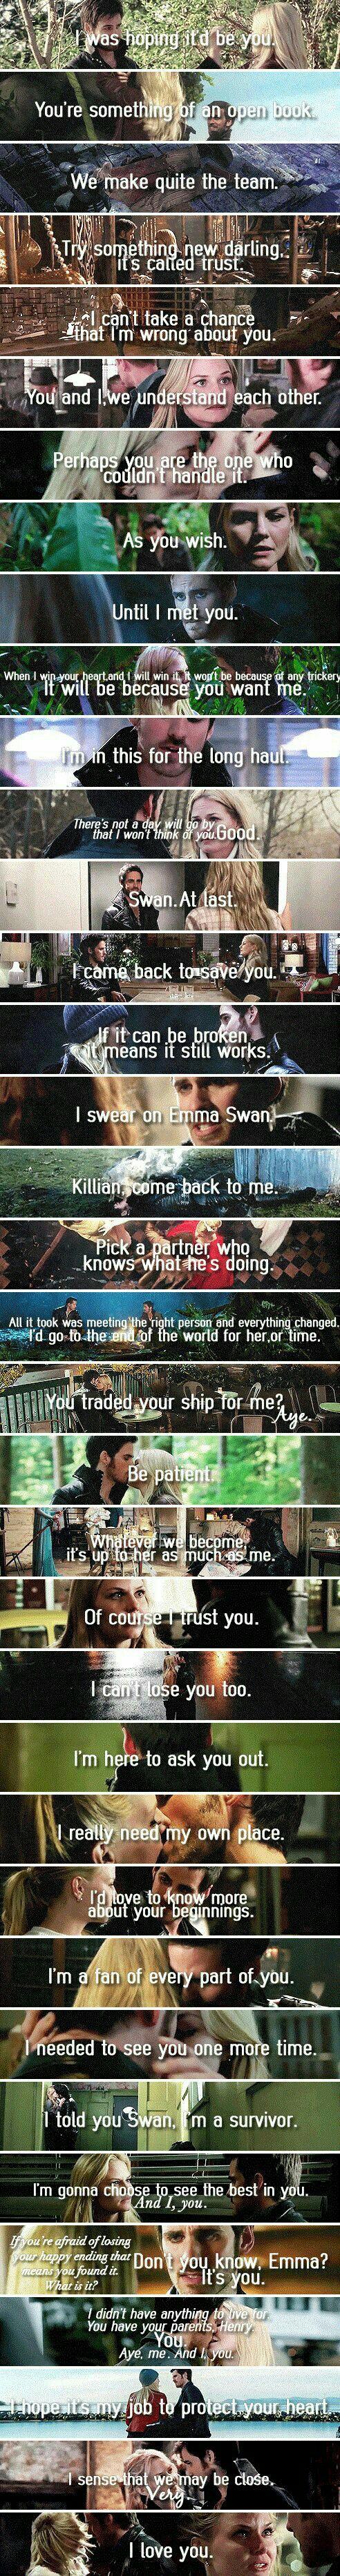 CaptainSwan quotes